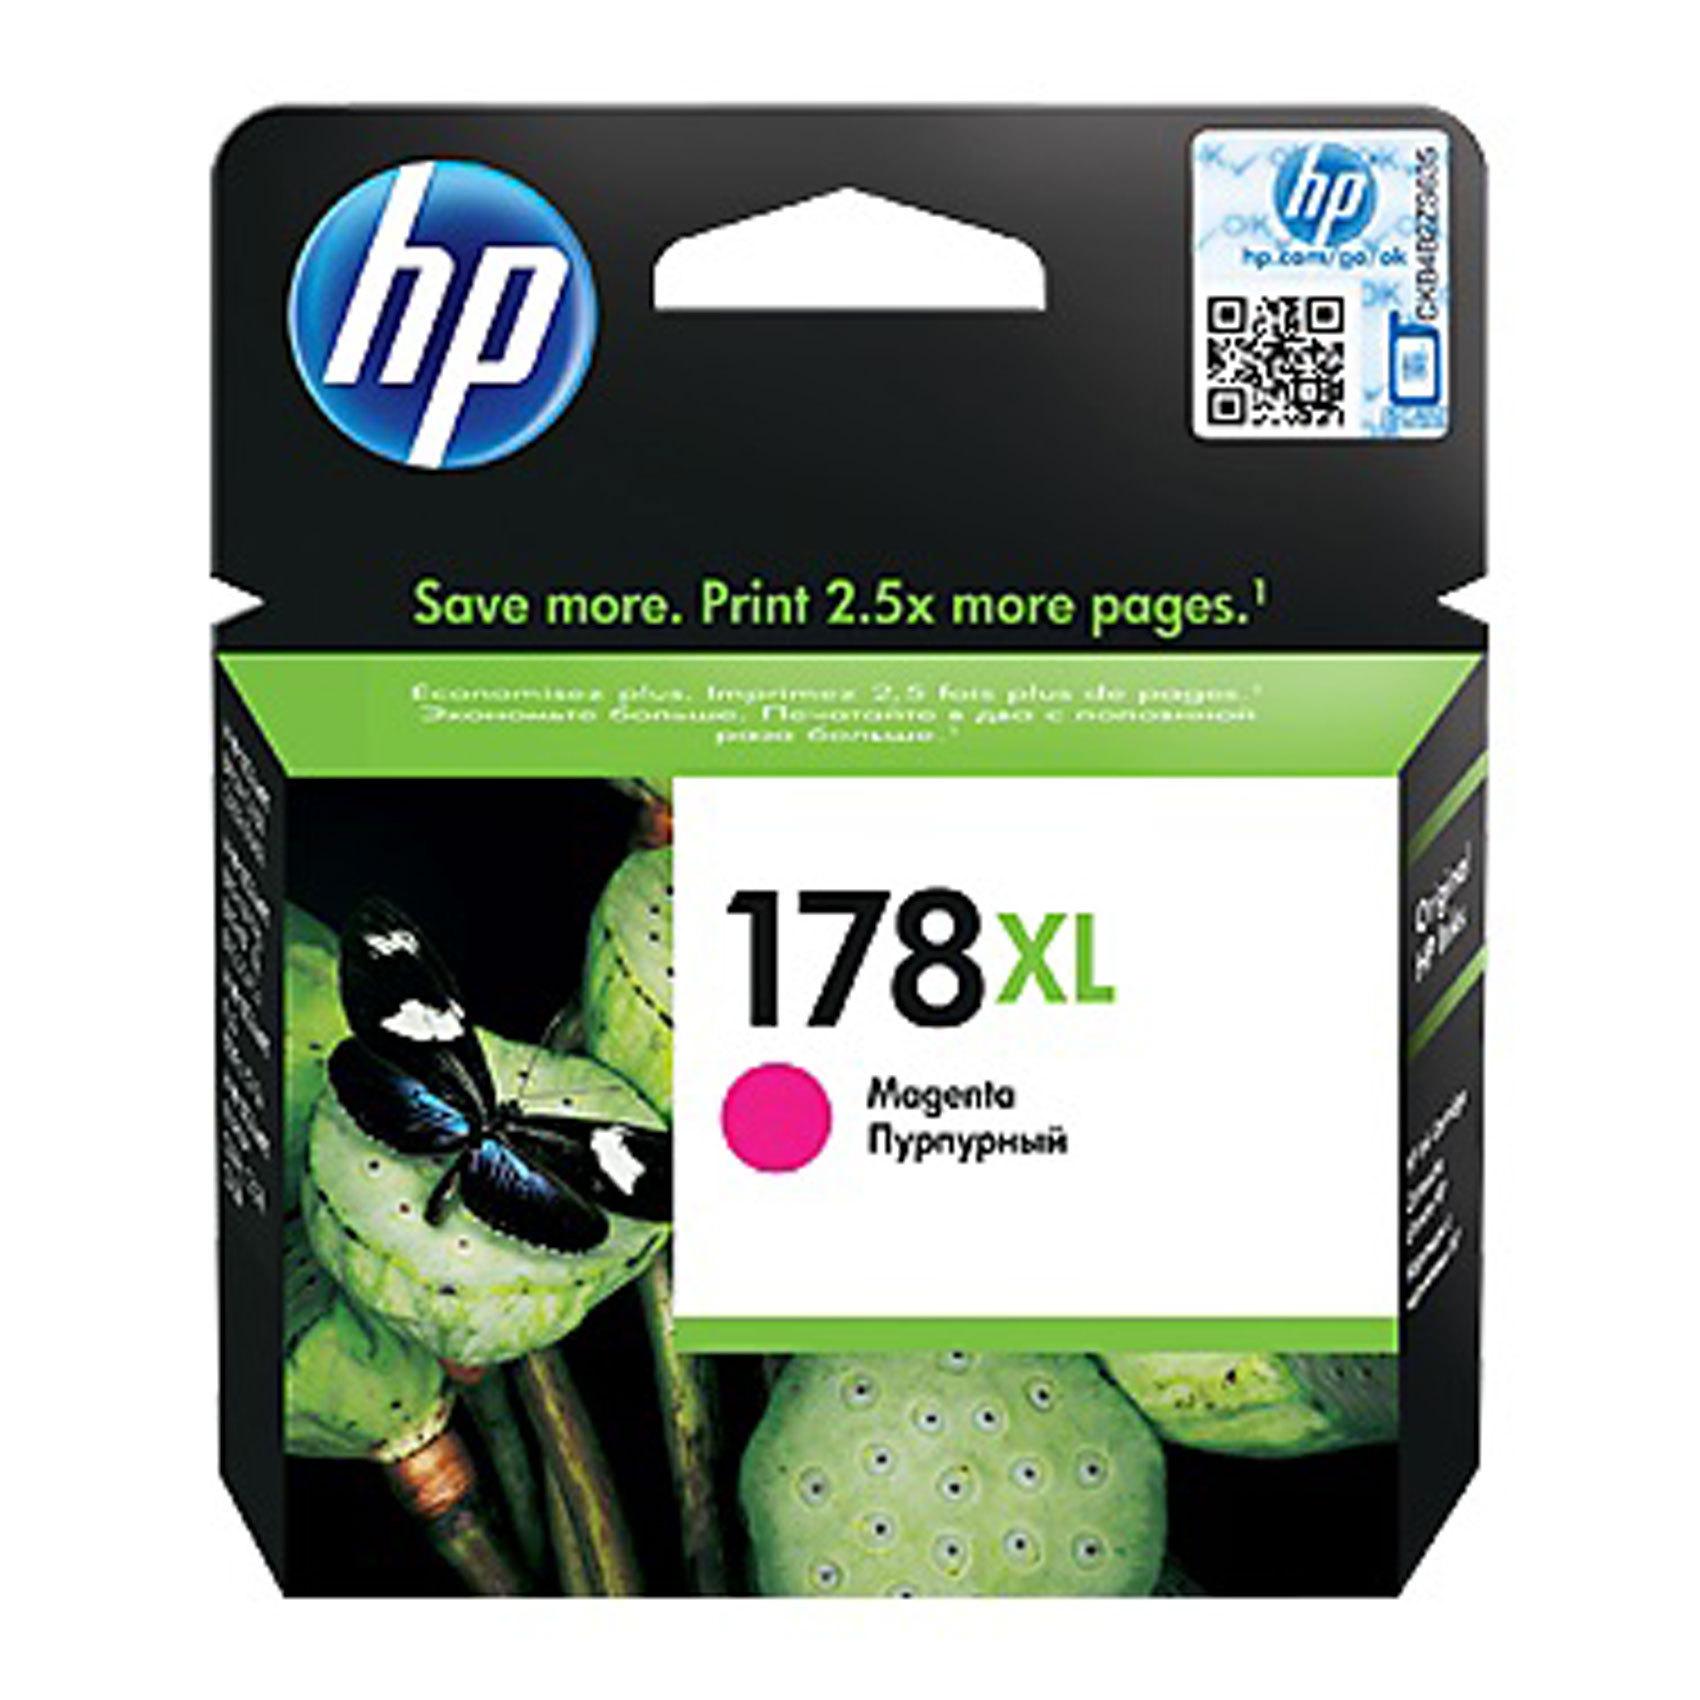 HP CART 178XL MAGENTA